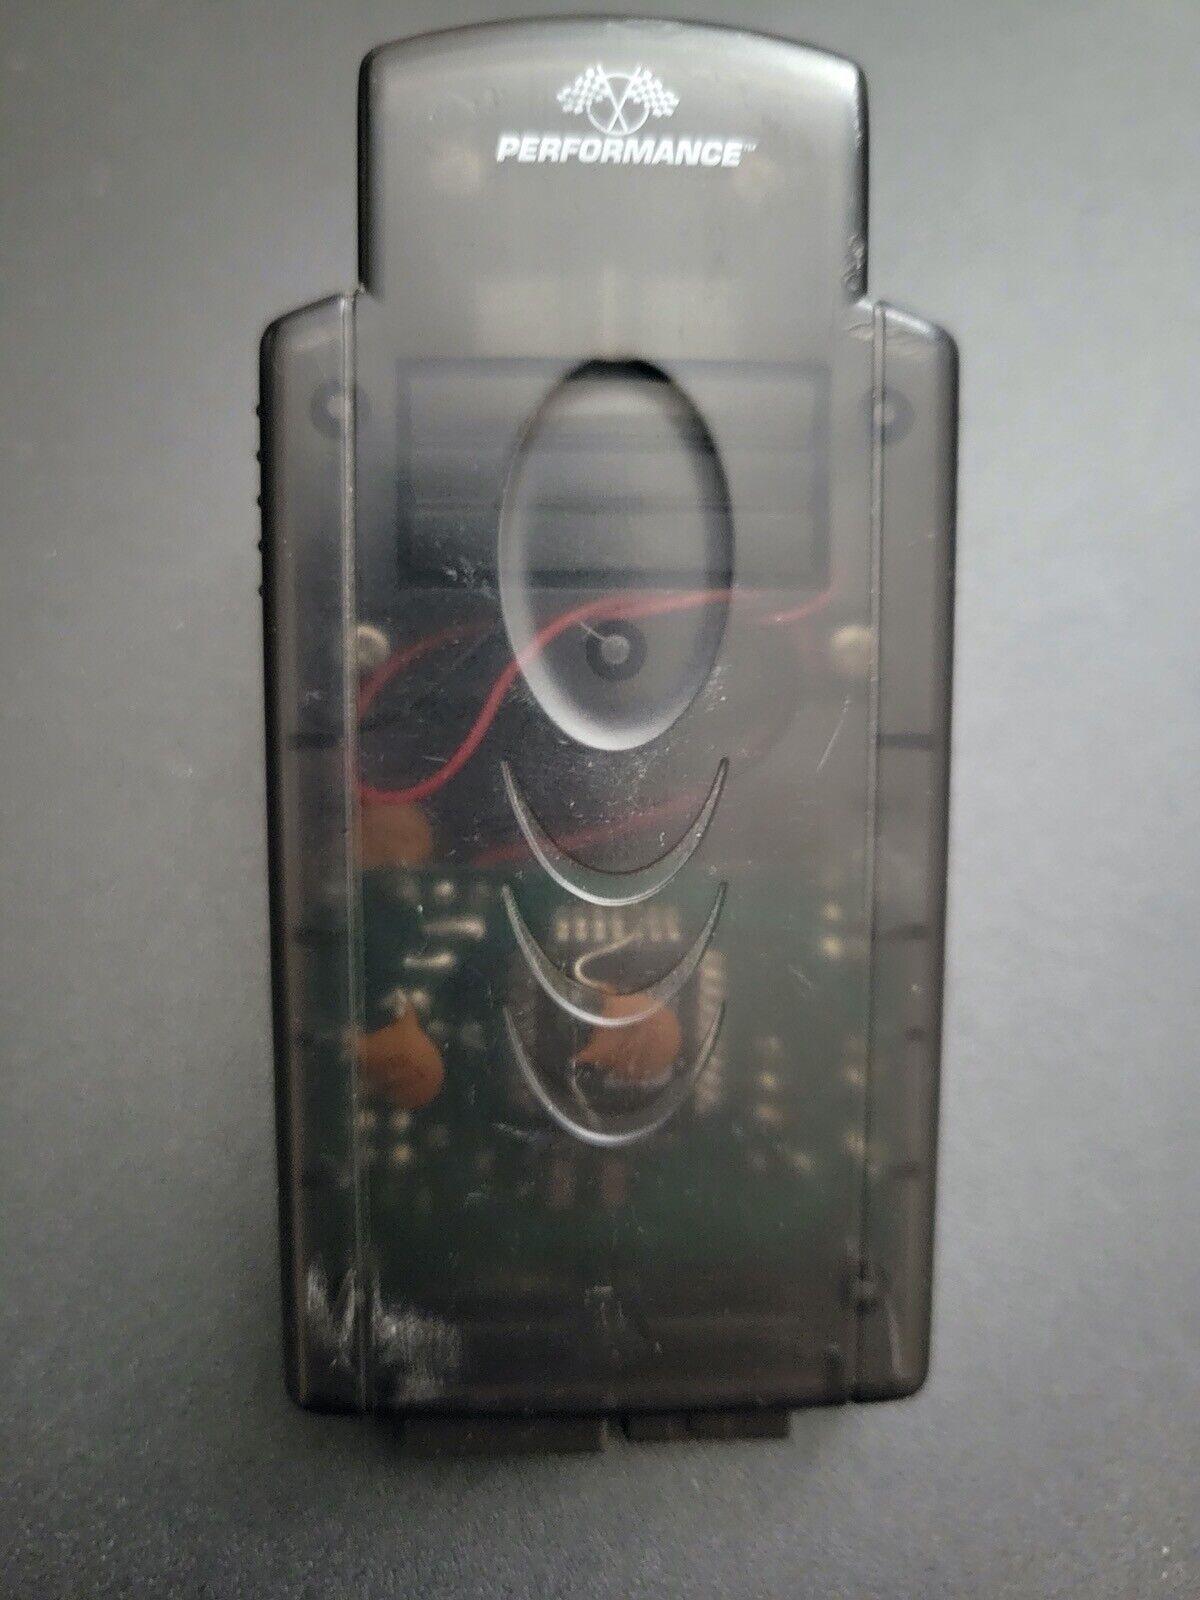 Performance Black Sega Dreamcast Tremor Rumble PaK Pack Very Good Condition